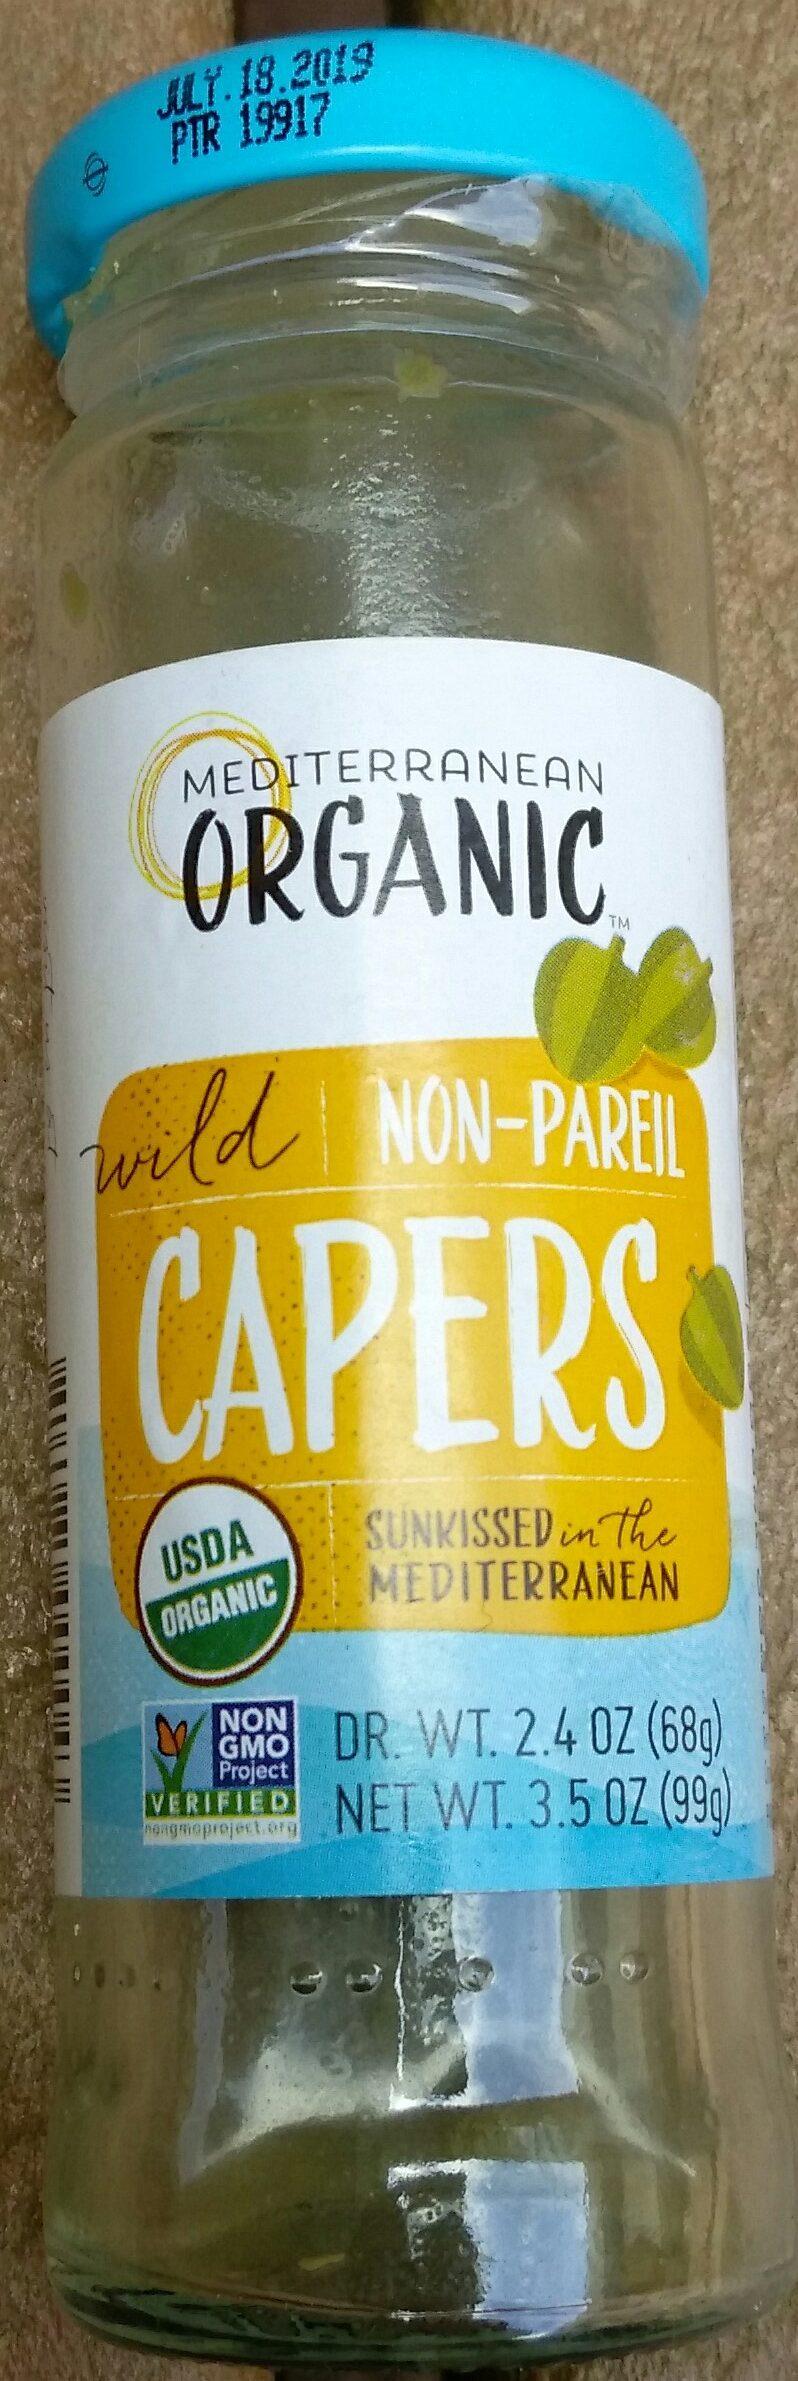 Wild Non-Pareil Capers - Product